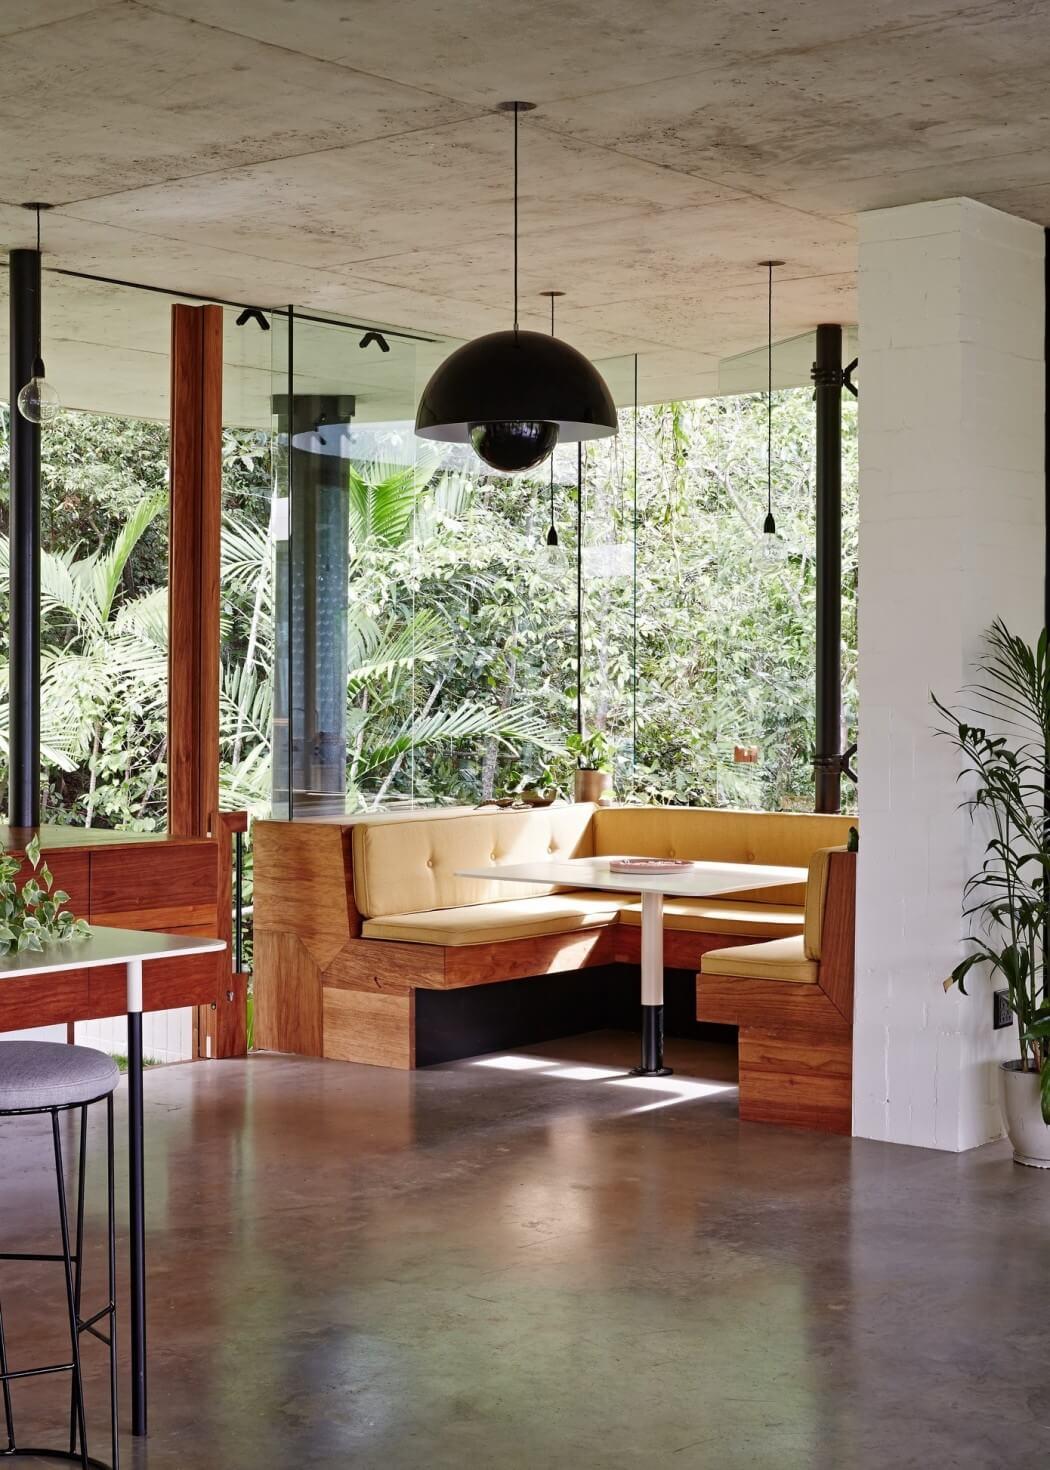 Planchonella House by Jesse Bennett Architect